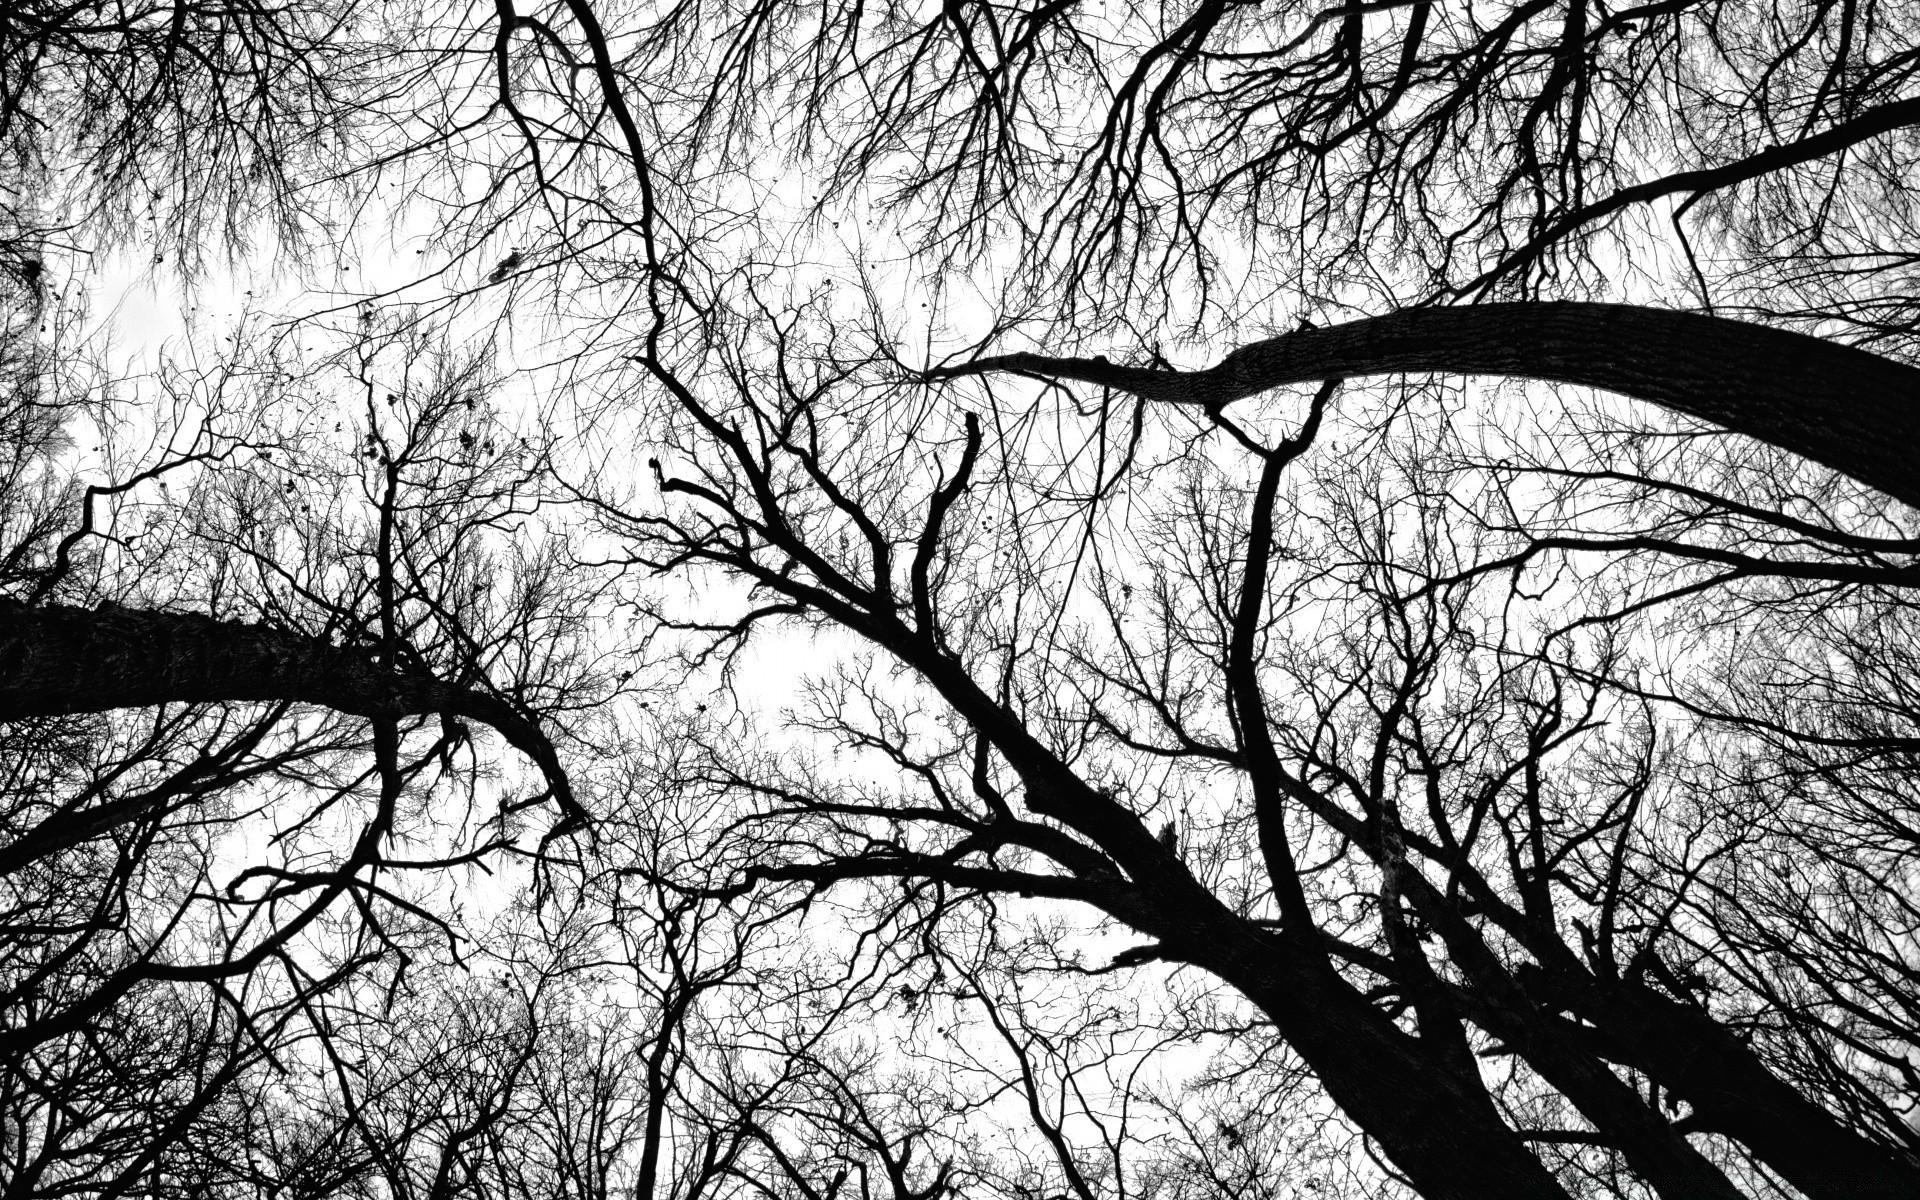 Утро осень, крутые картинки дерево